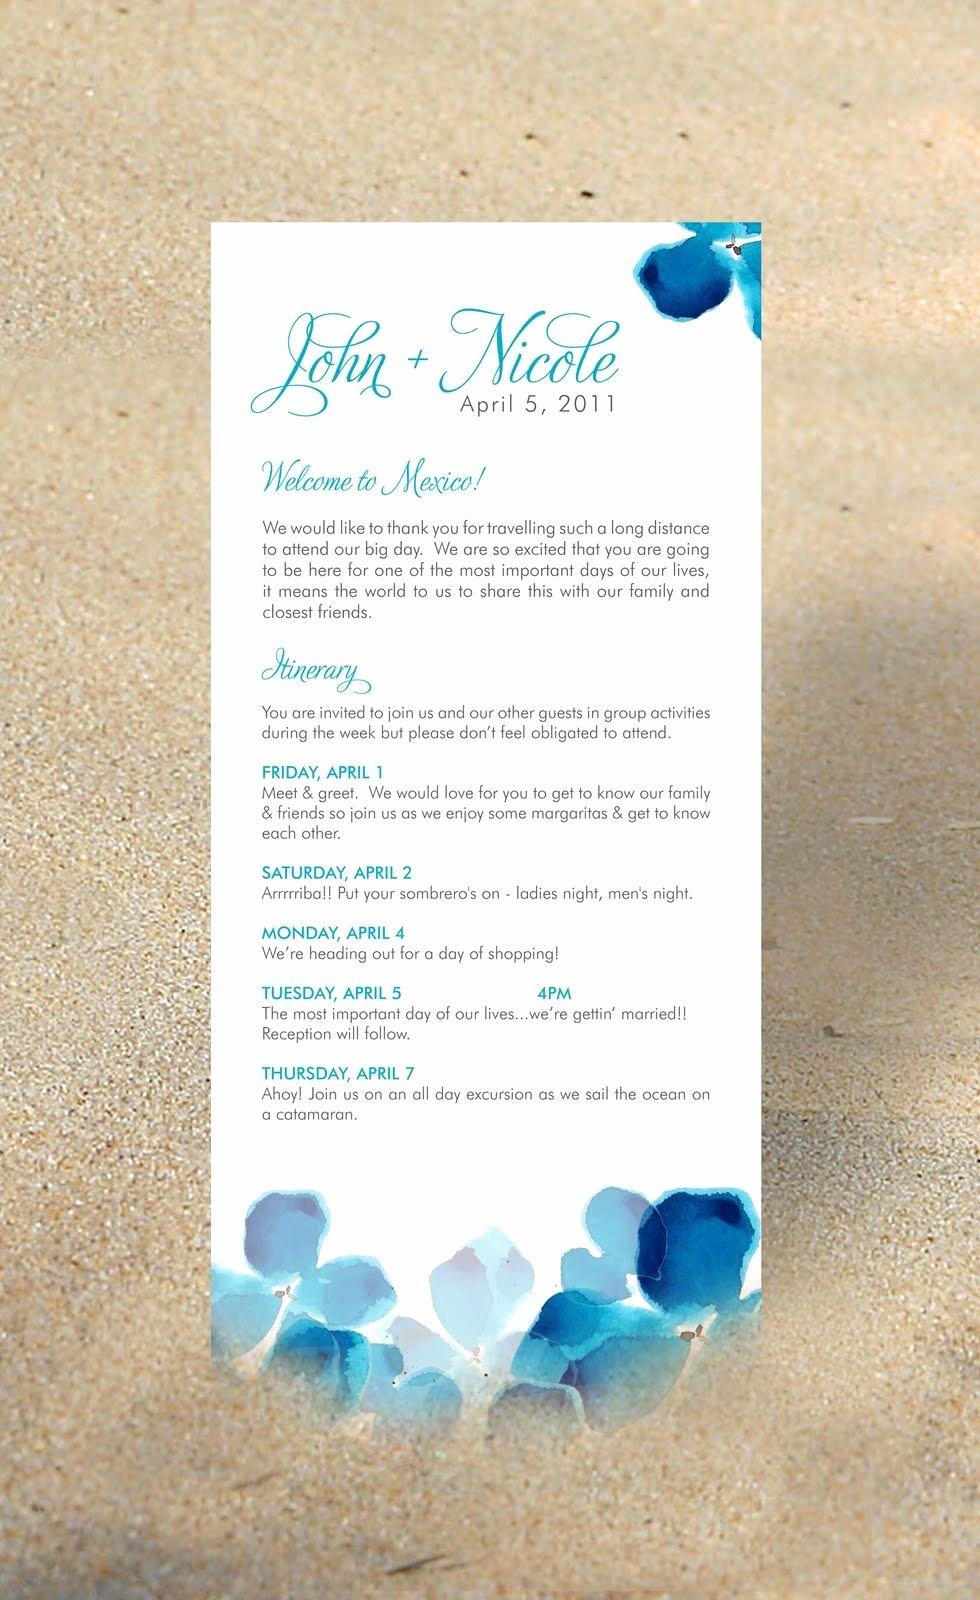 Destination Wedding Itinerary Template Unique Paper Airplanes Destination Wedding Itinerary Vegas In 2019